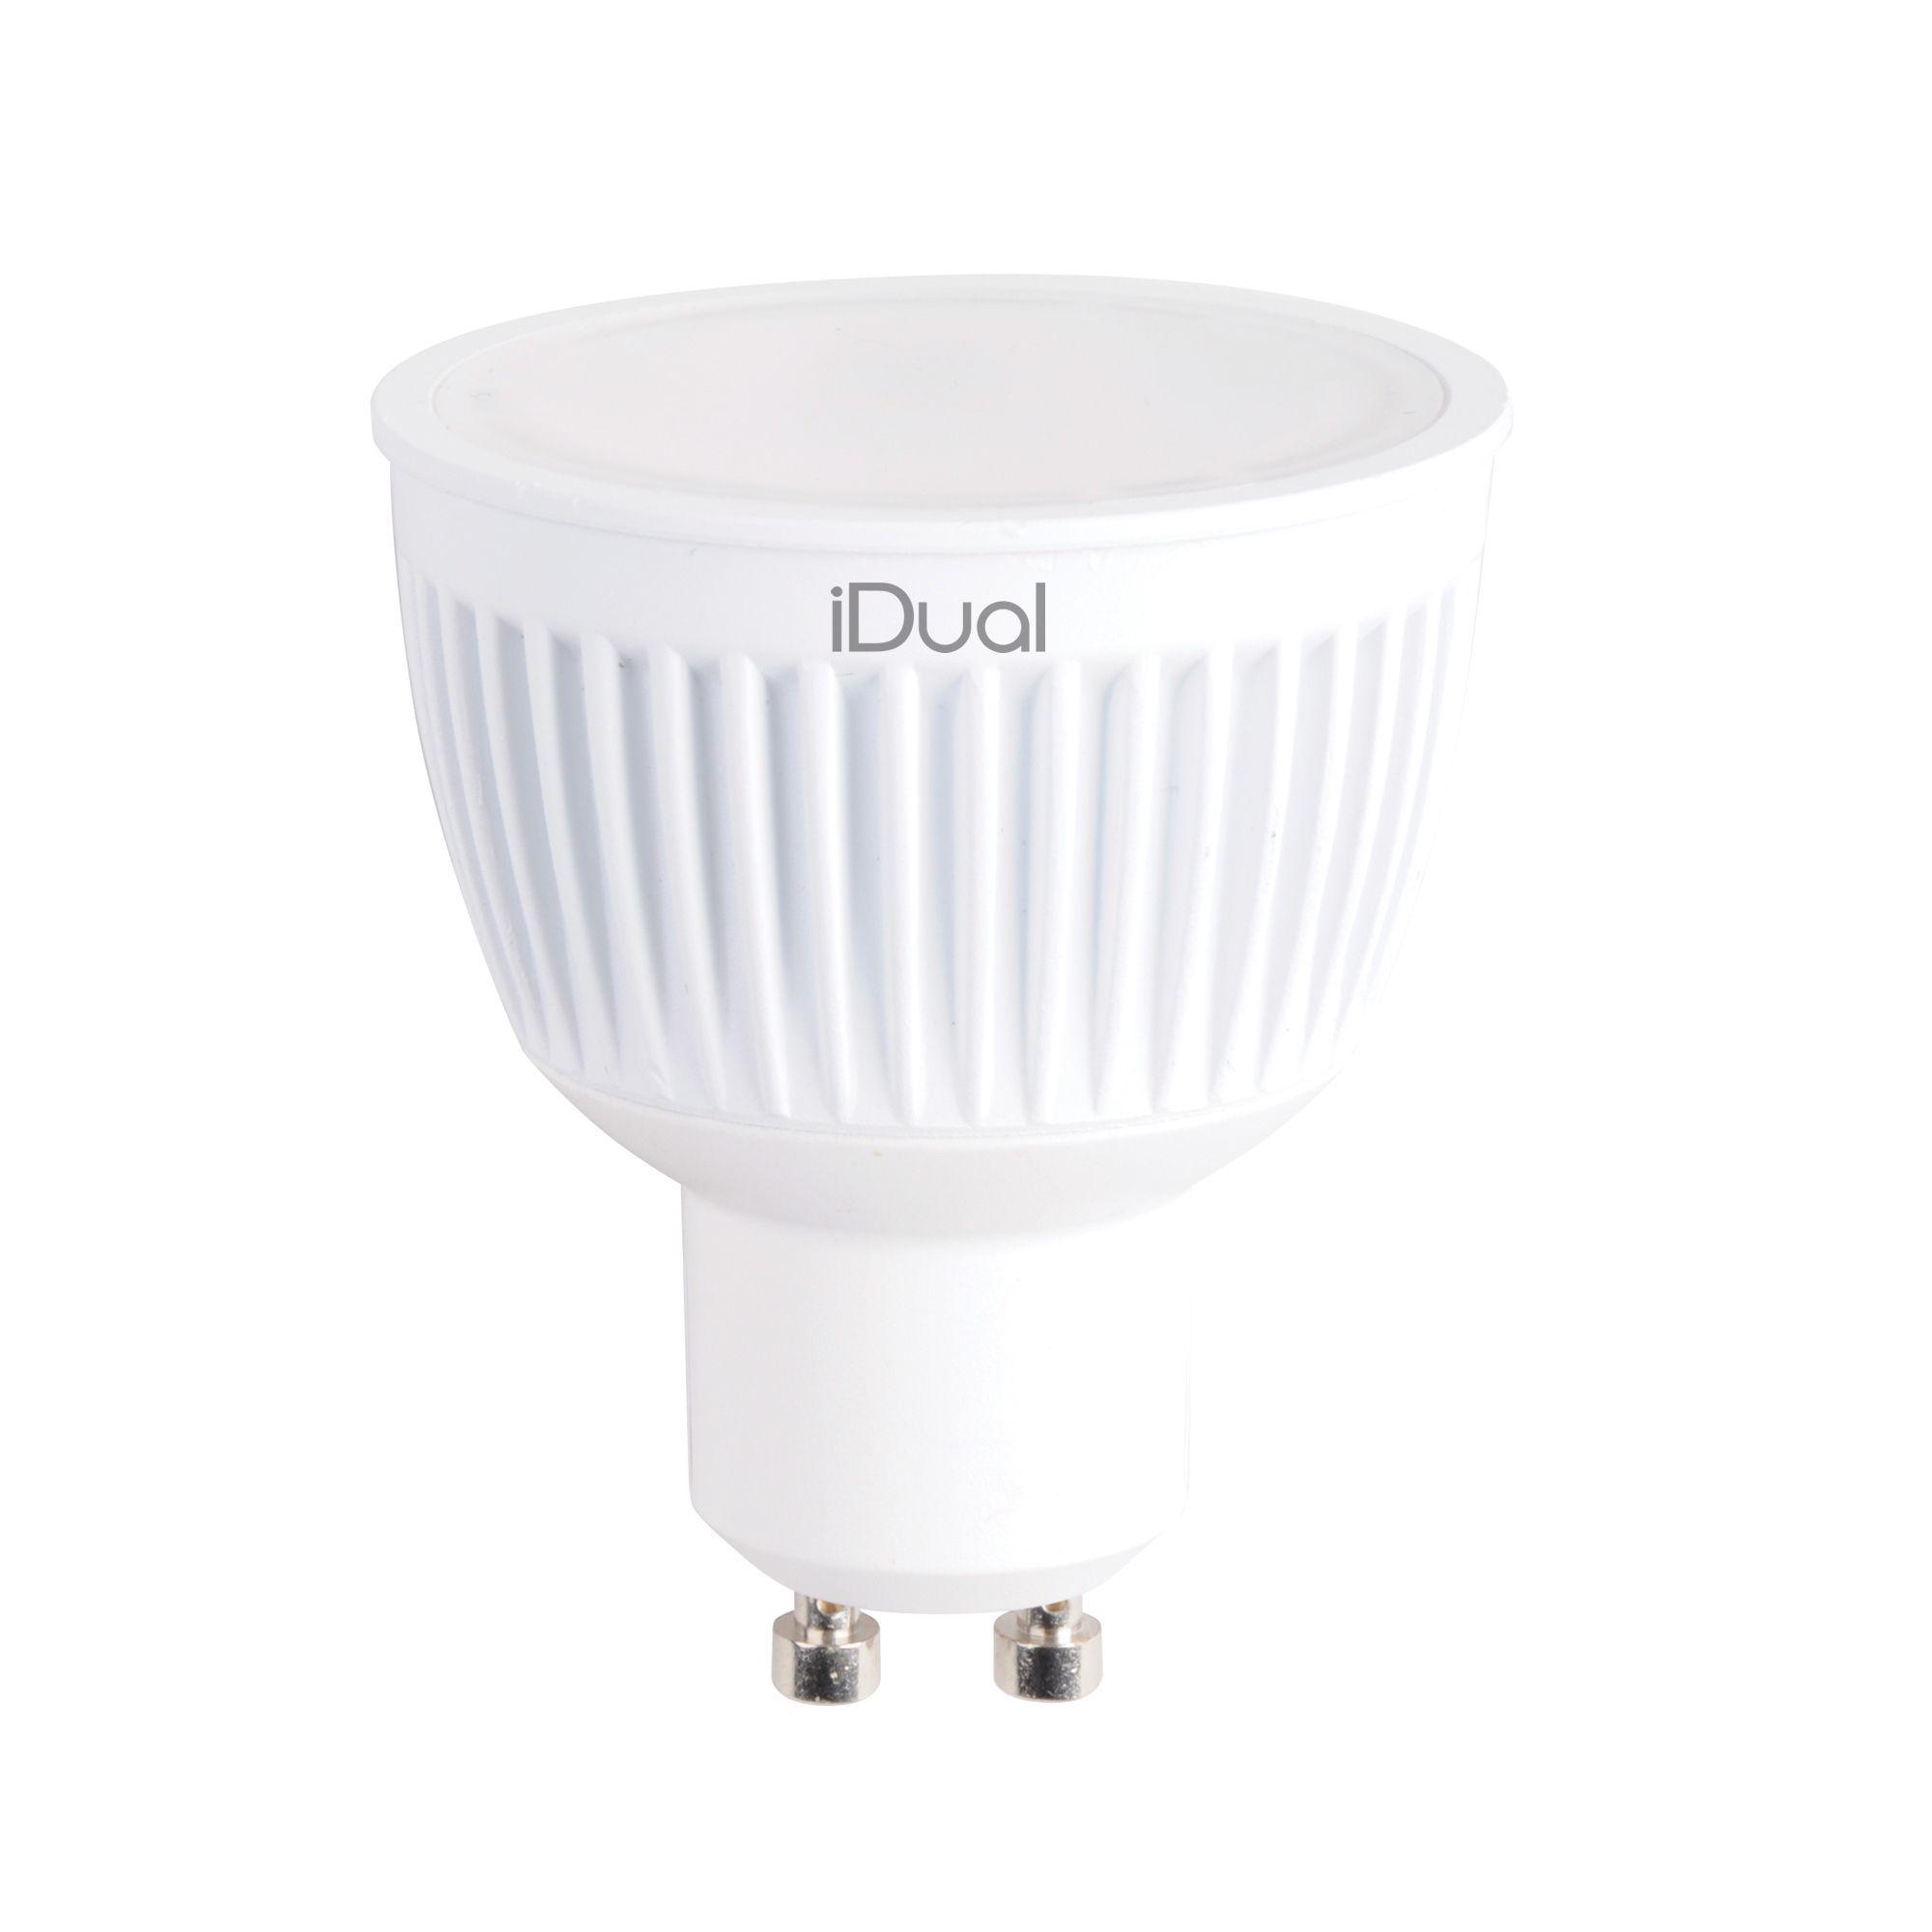 IDual GU10 345lm LED Dimmable Reflector Spot Light Bulb